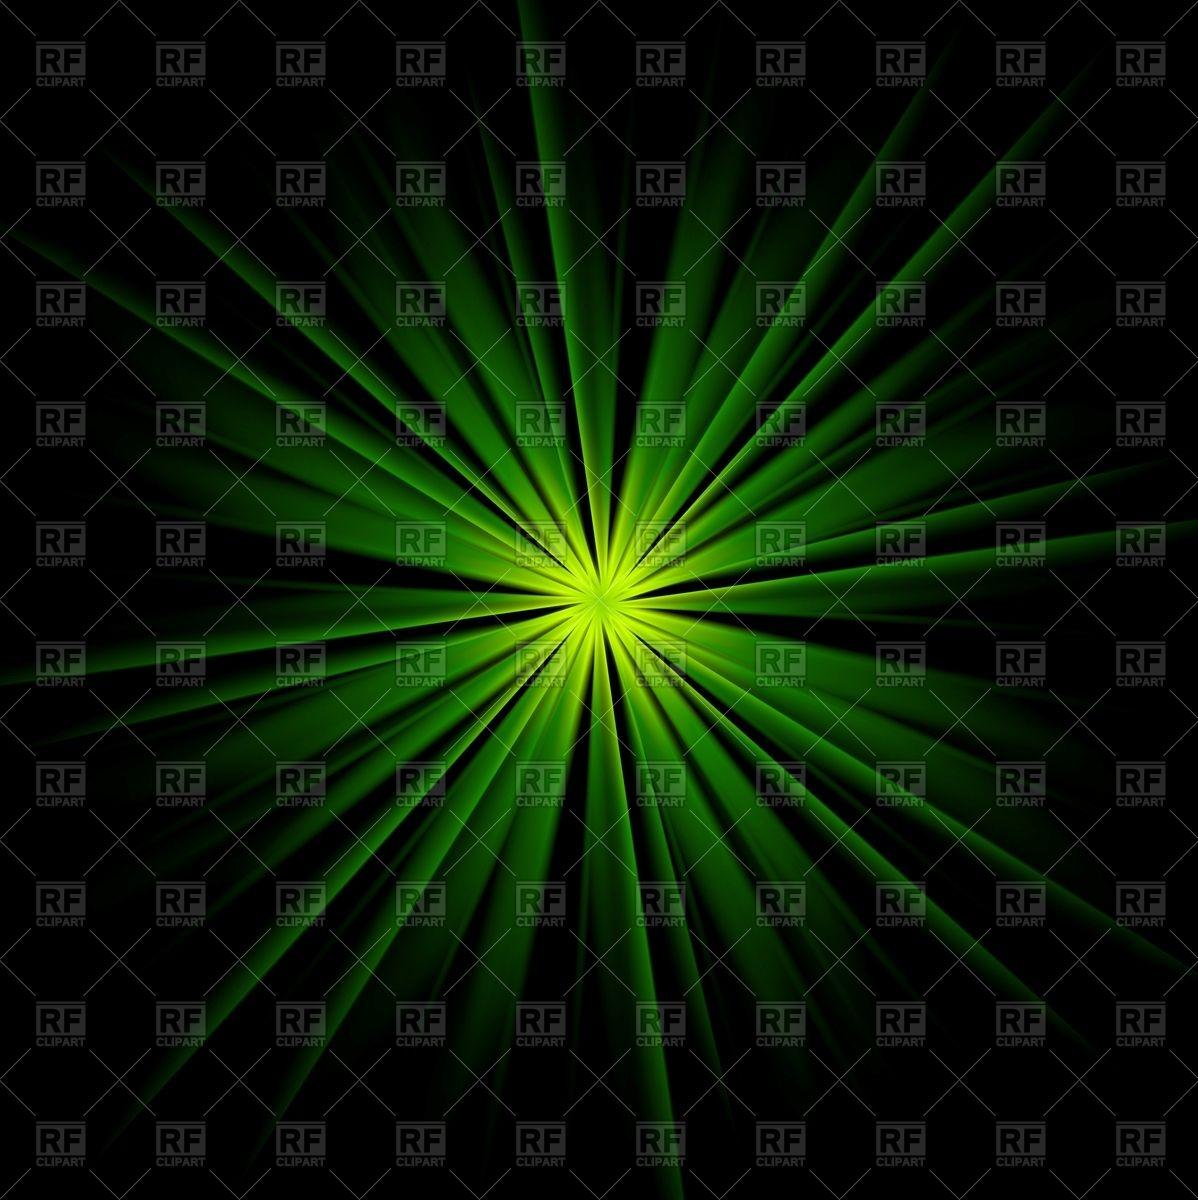 Dark green beams abstract background Vector Image #95113.